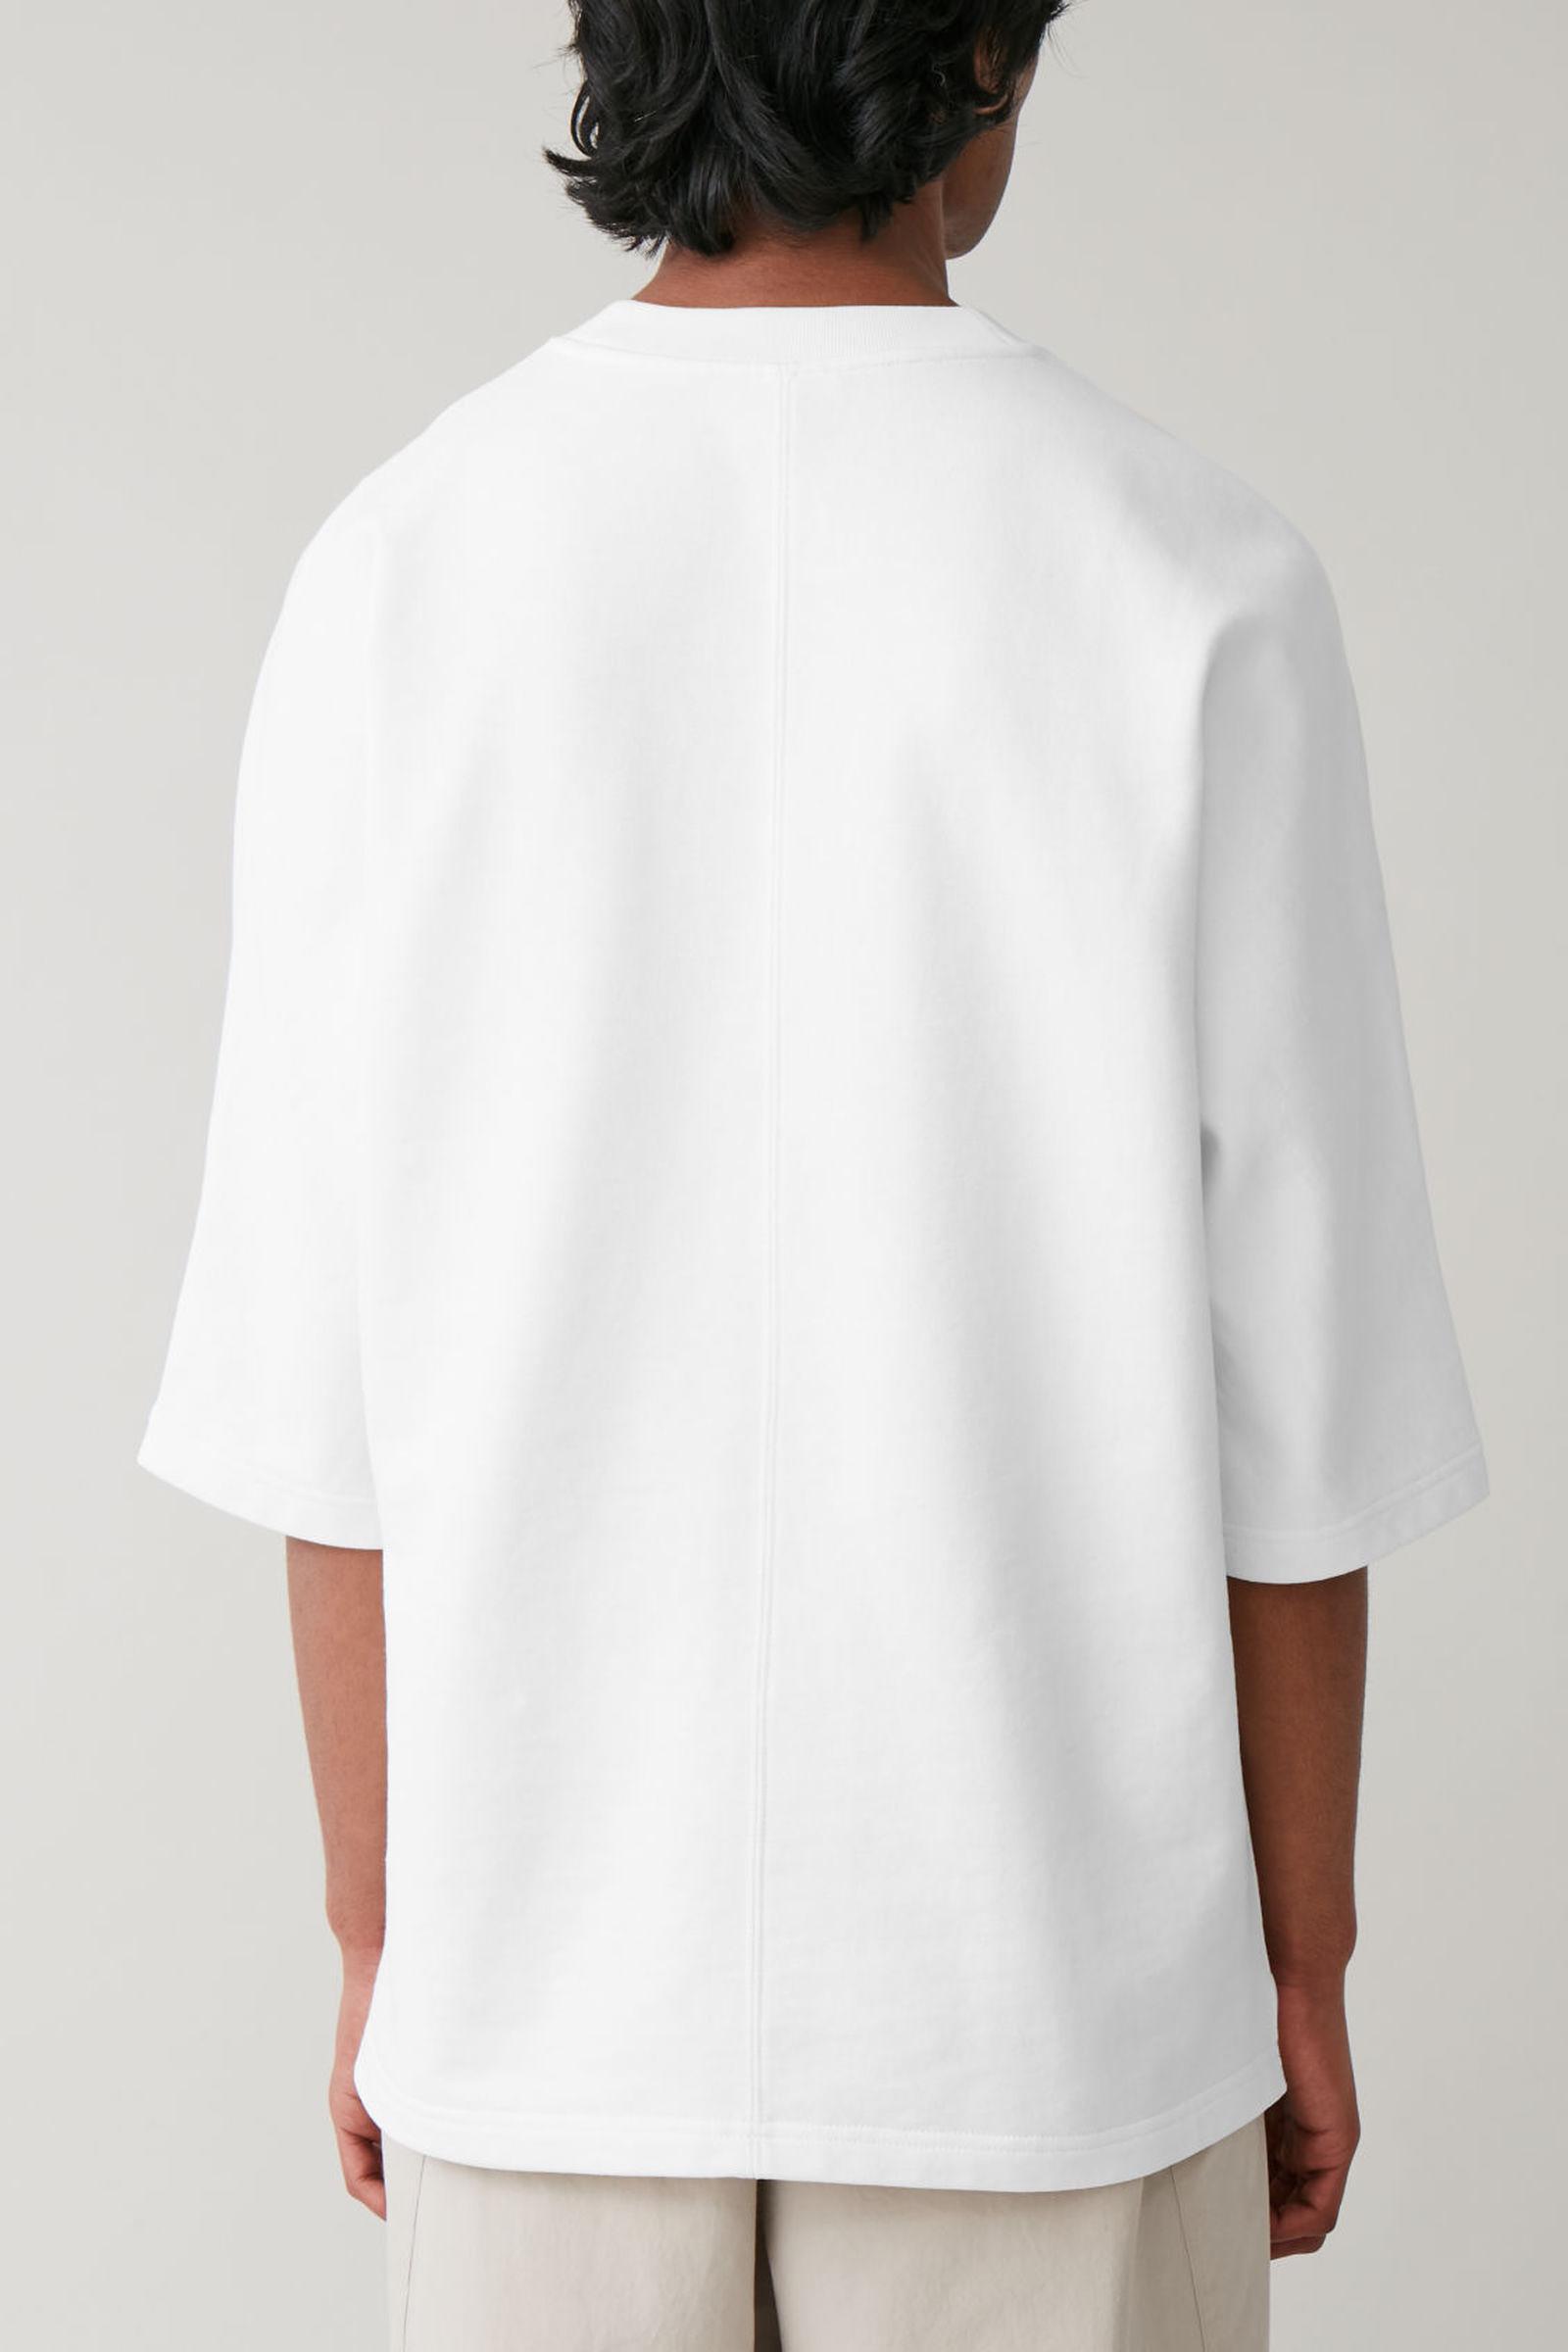 COS 코튼 리넨 저지 티셔츠의 화이트컬러 ECOMLook입니다.